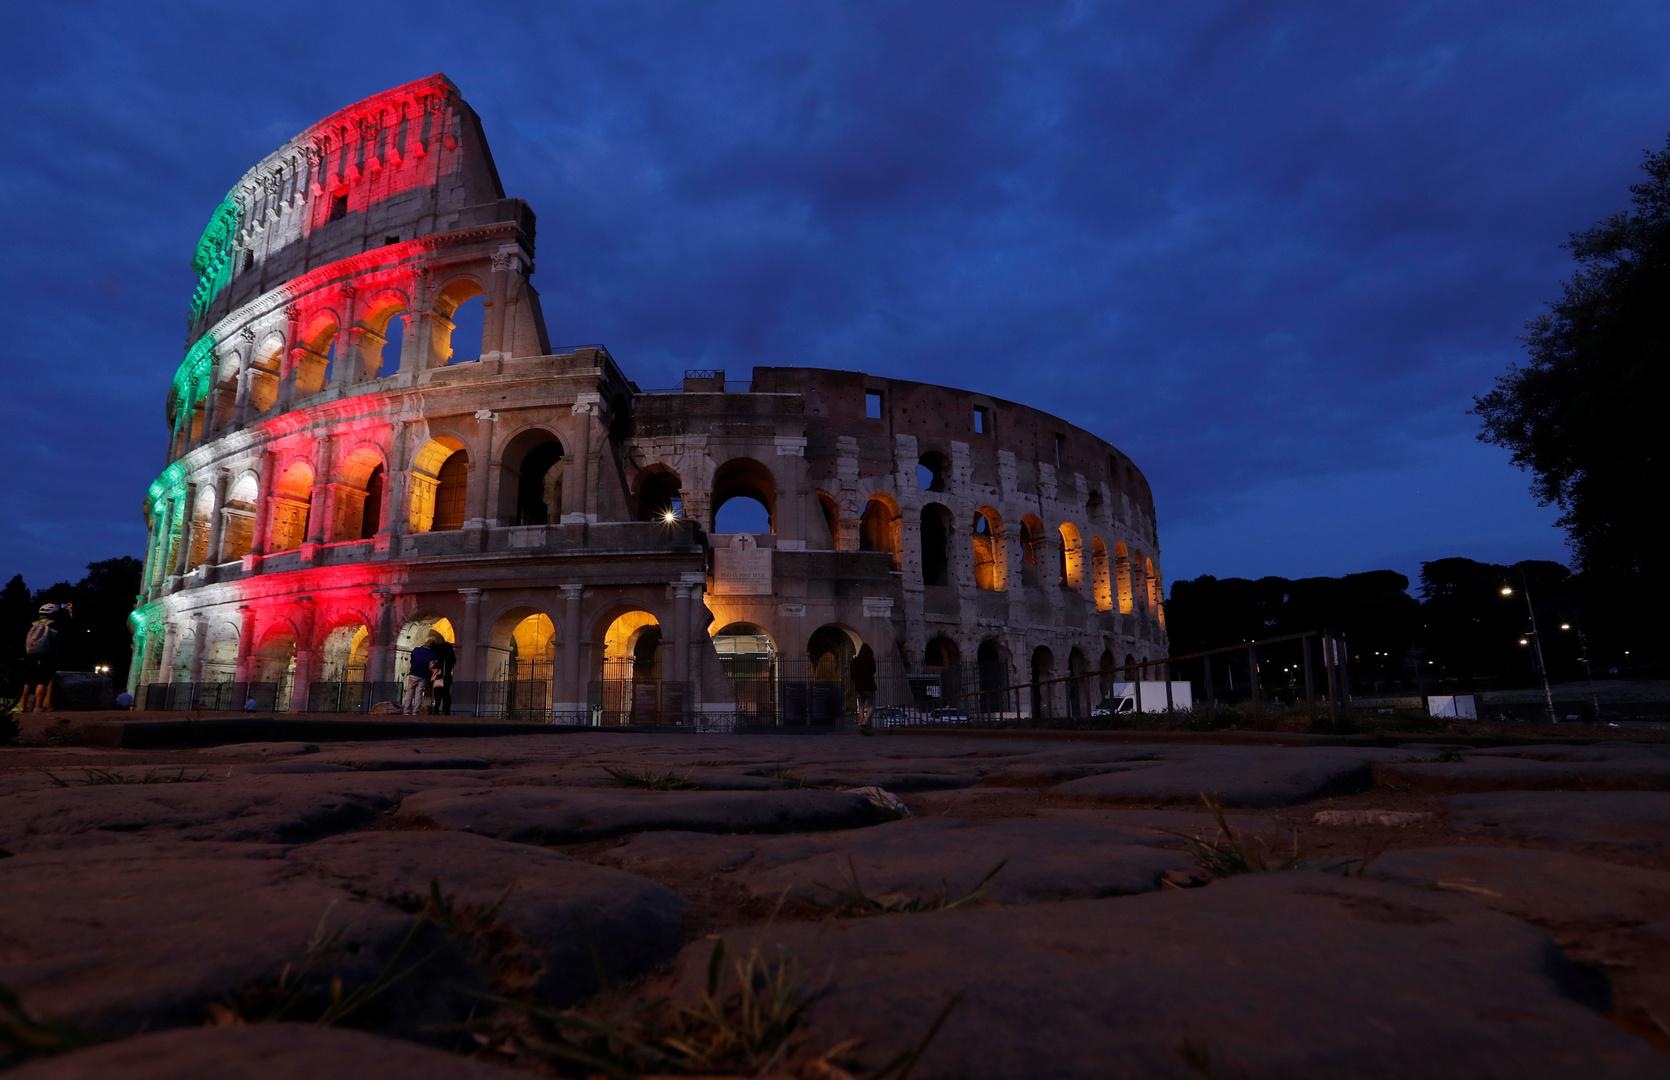 إيطاليا تتبرع بمبلغ 6,8 مليون يورو لبرامج وخدمات